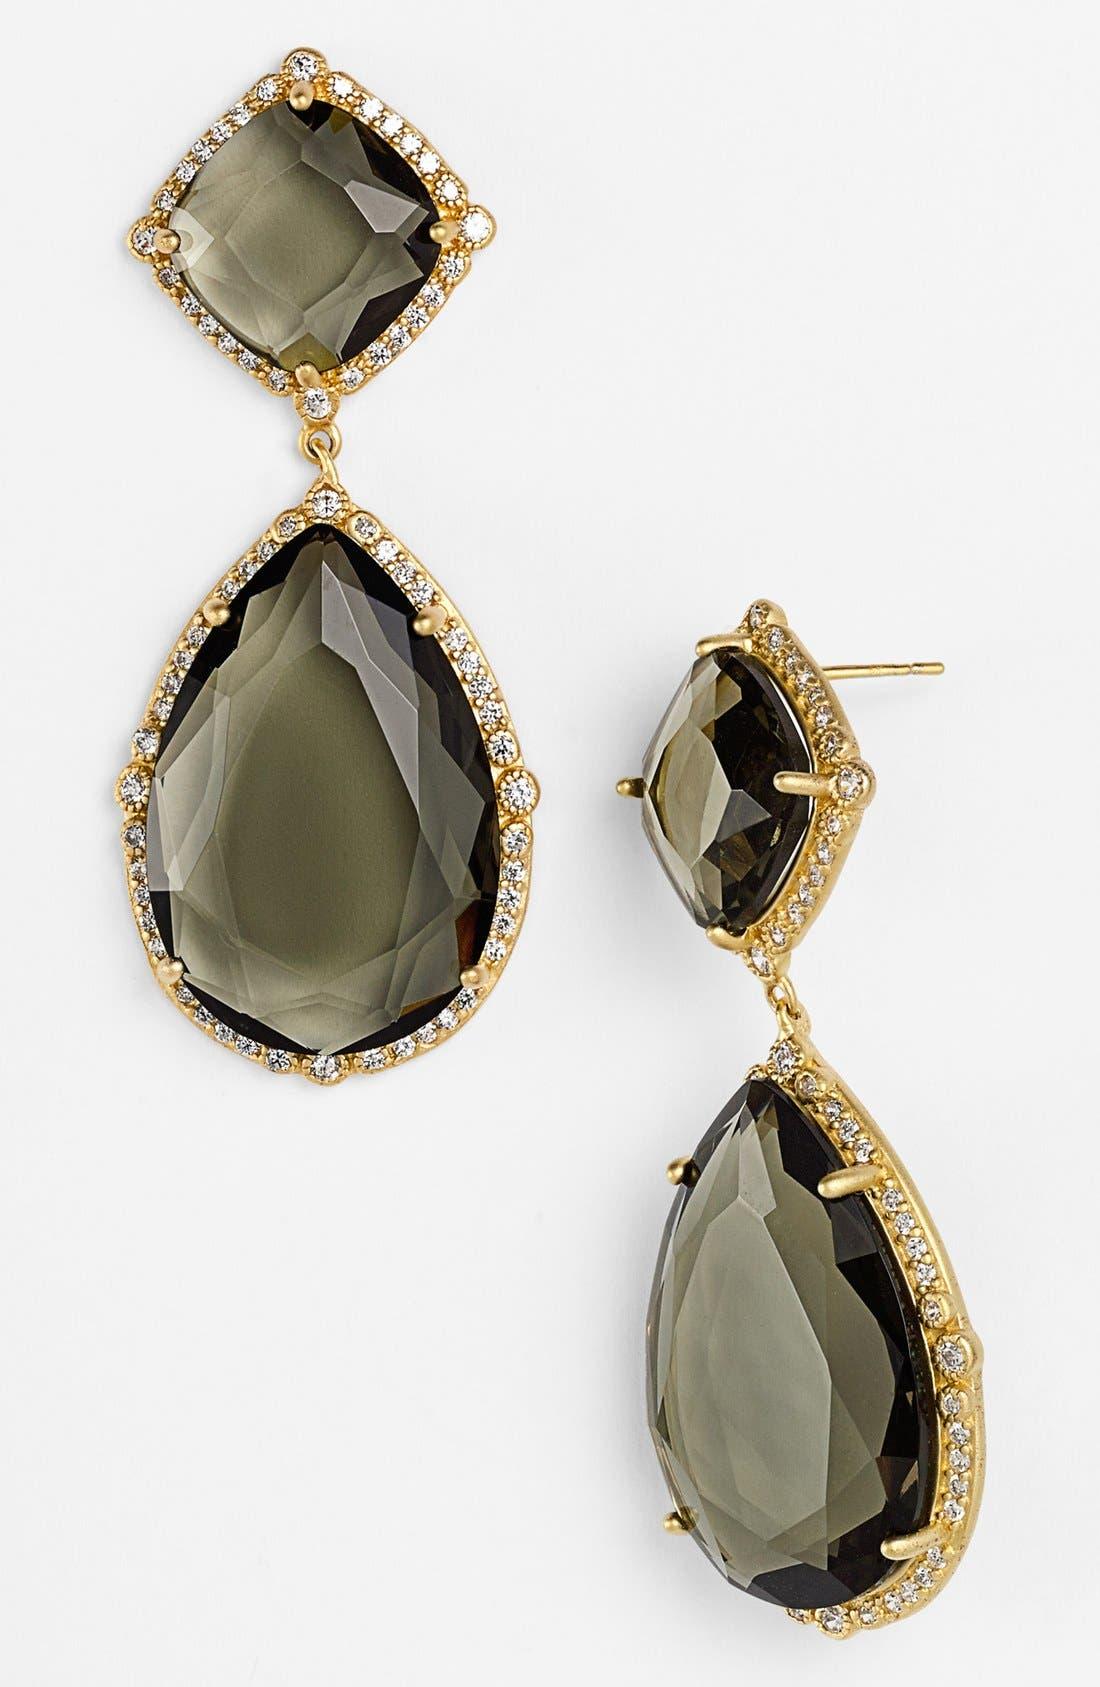 FREIDA ROTHMAN 'Metropolitan' Stone Drop Earrings